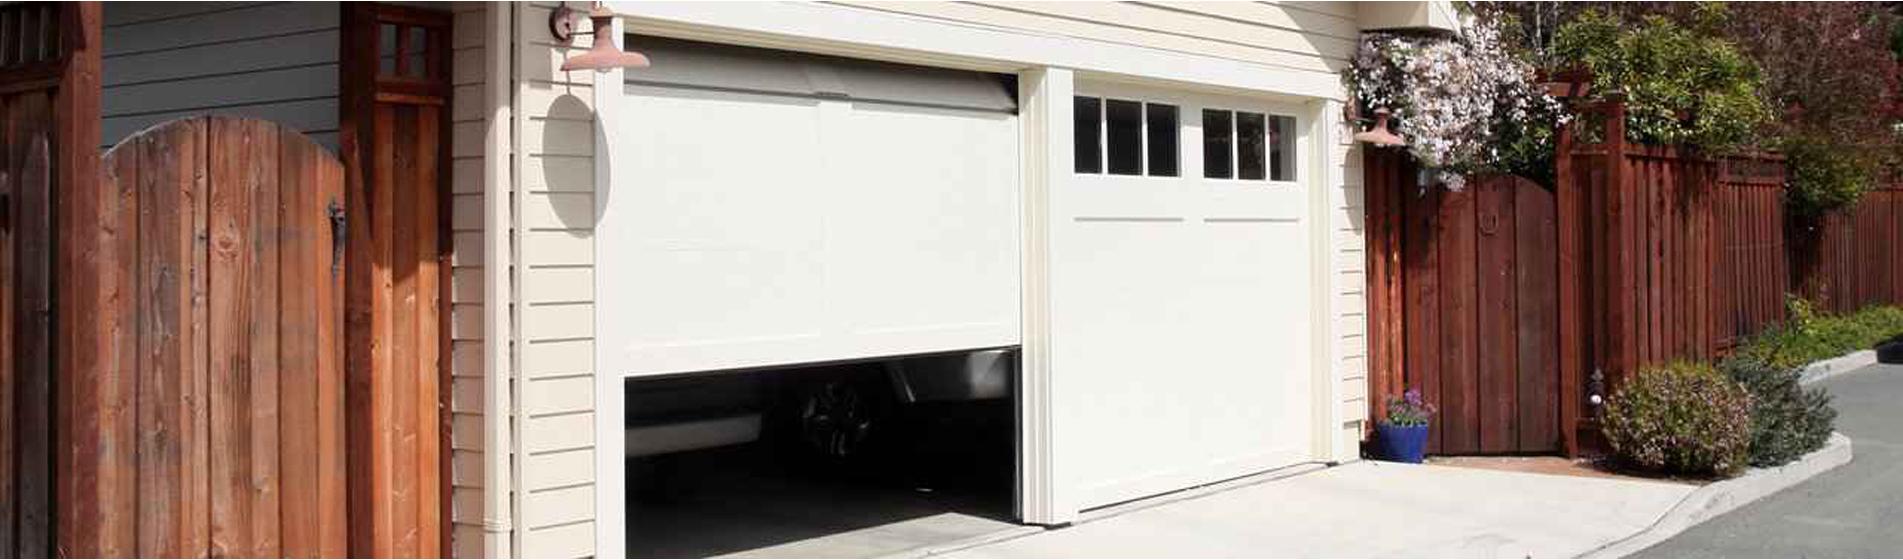 fabricant porte de garage sur-mesure Avignon